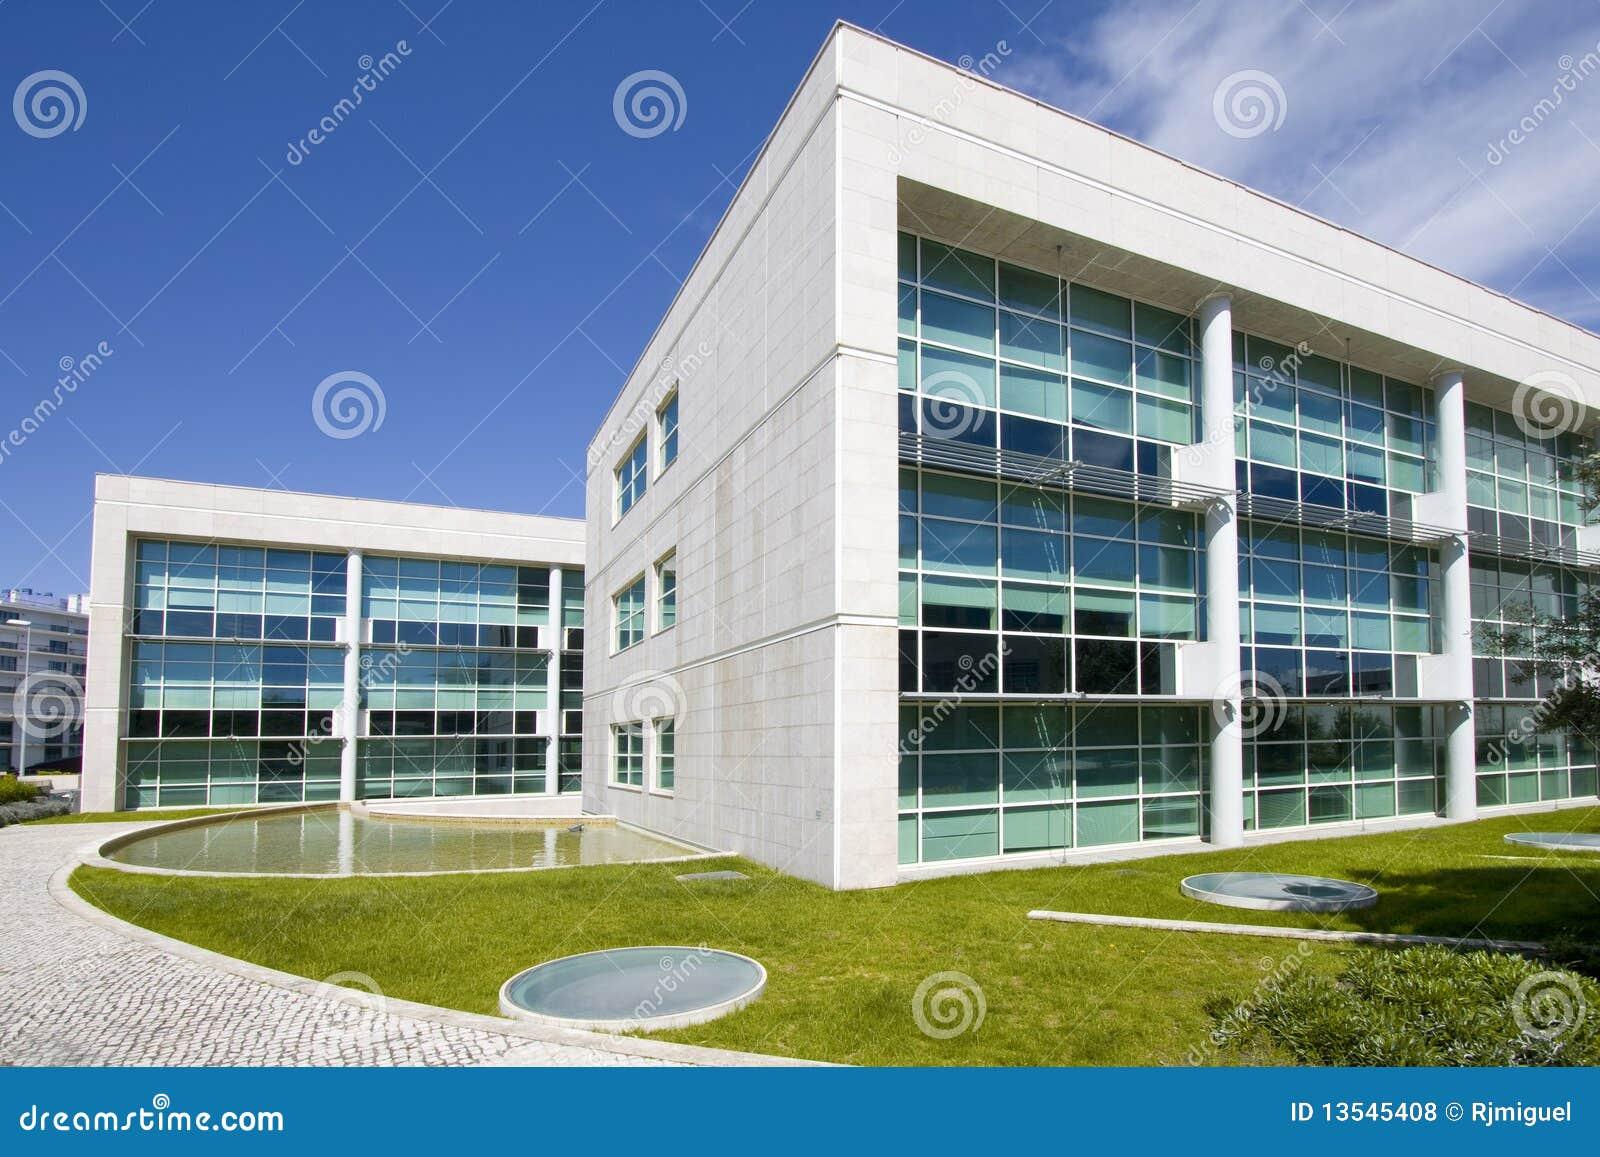 Vista exterior de los edificios de oficinas c ntricos de for Exterior edificios